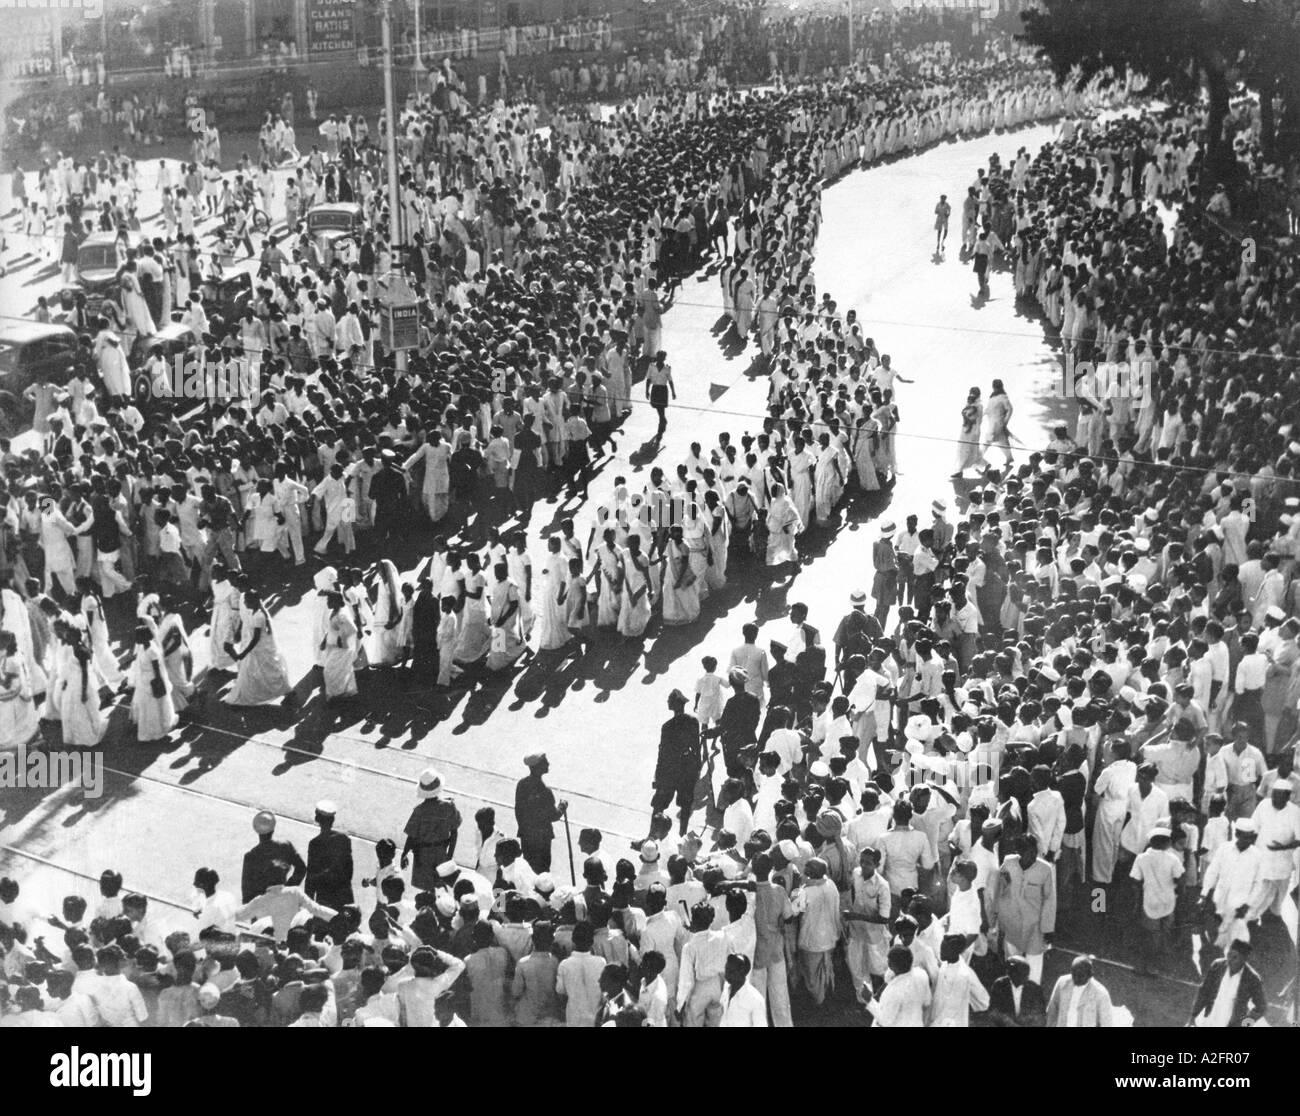 Procession by women during satyagraha campaign agitation freedom movement in Bombay now Mumbai Maharashtra India - MKG 33262 - Stock Image